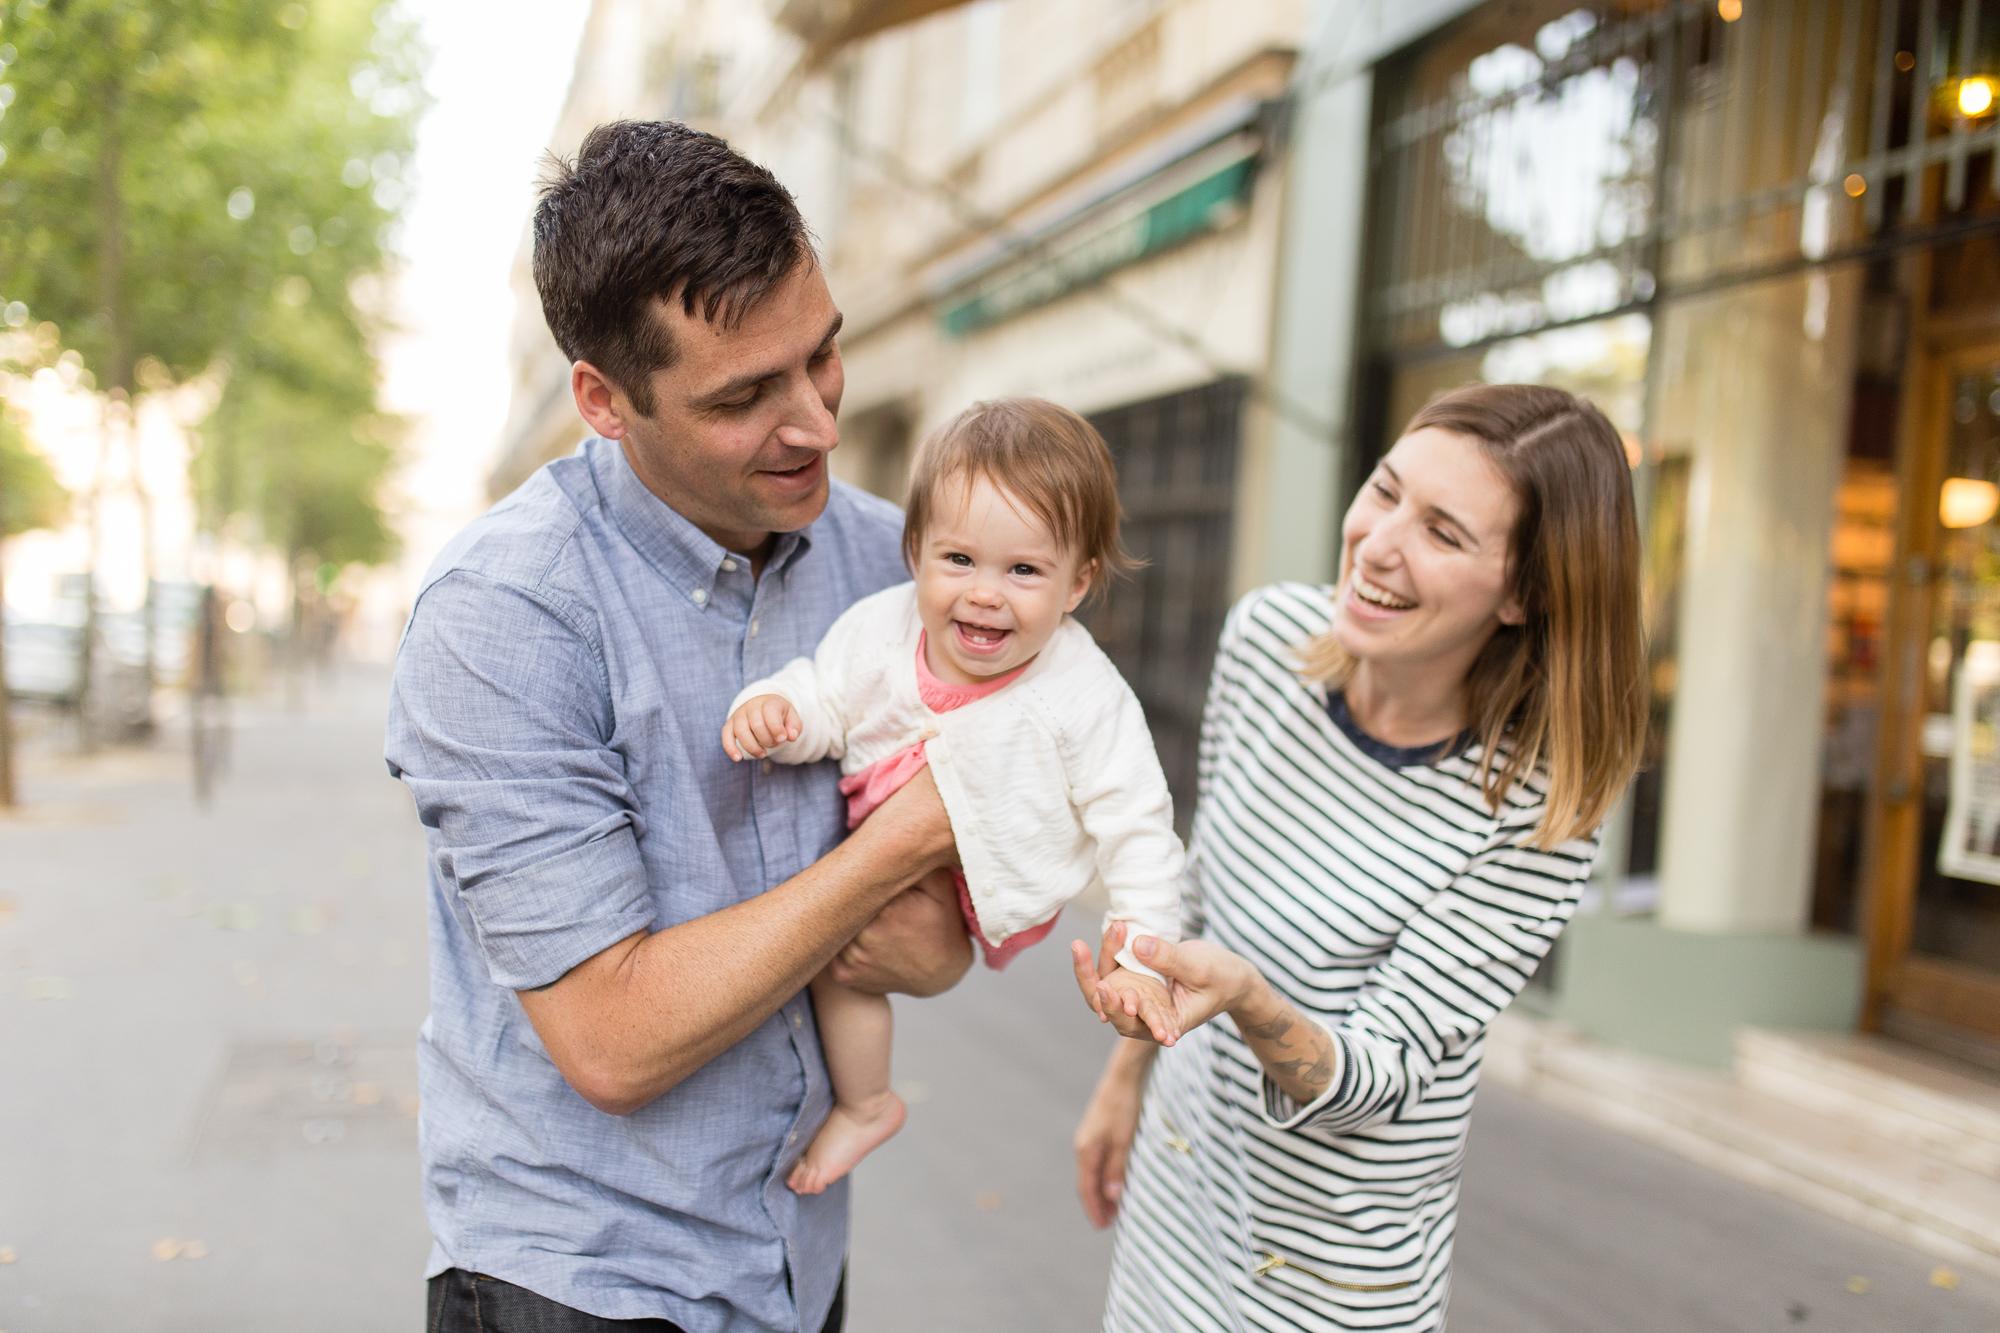 paris-europe-lifestyle-family-photographer-8.jpg